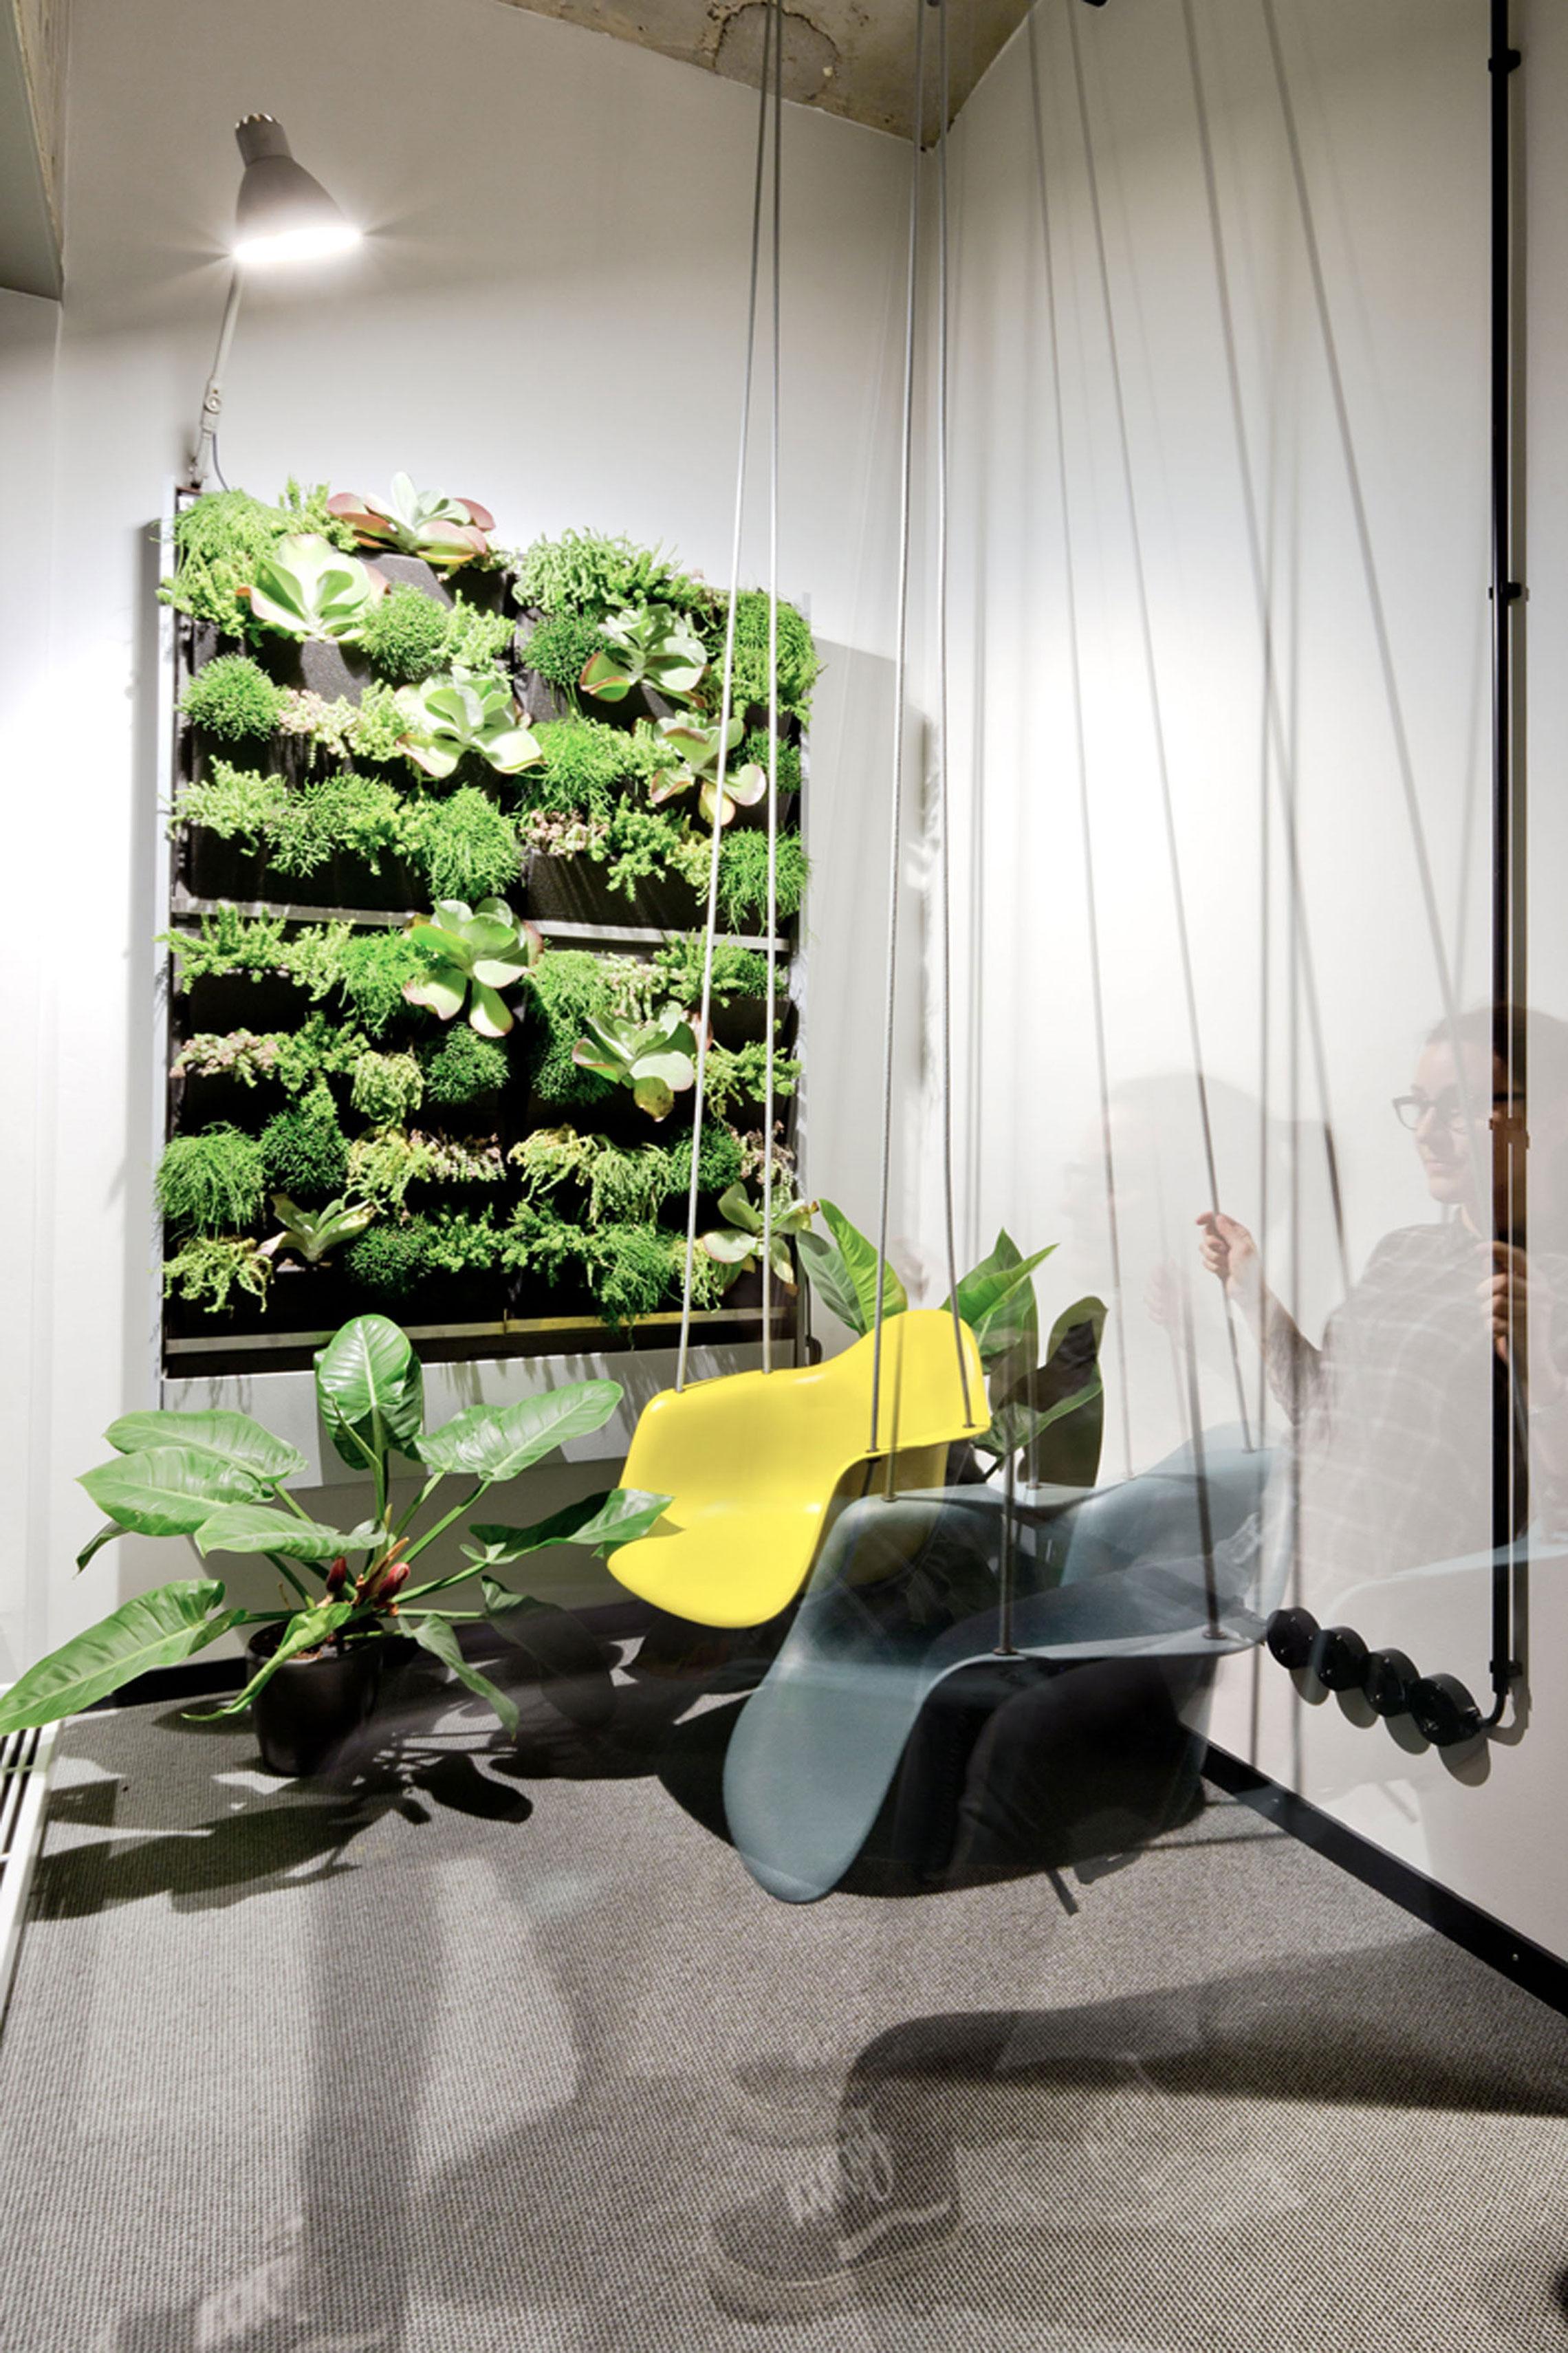 plyatelier project collins hamburg c julia maria max 1 office inspiration. Black Bedroom Furniture Sets. Home Design Ideas